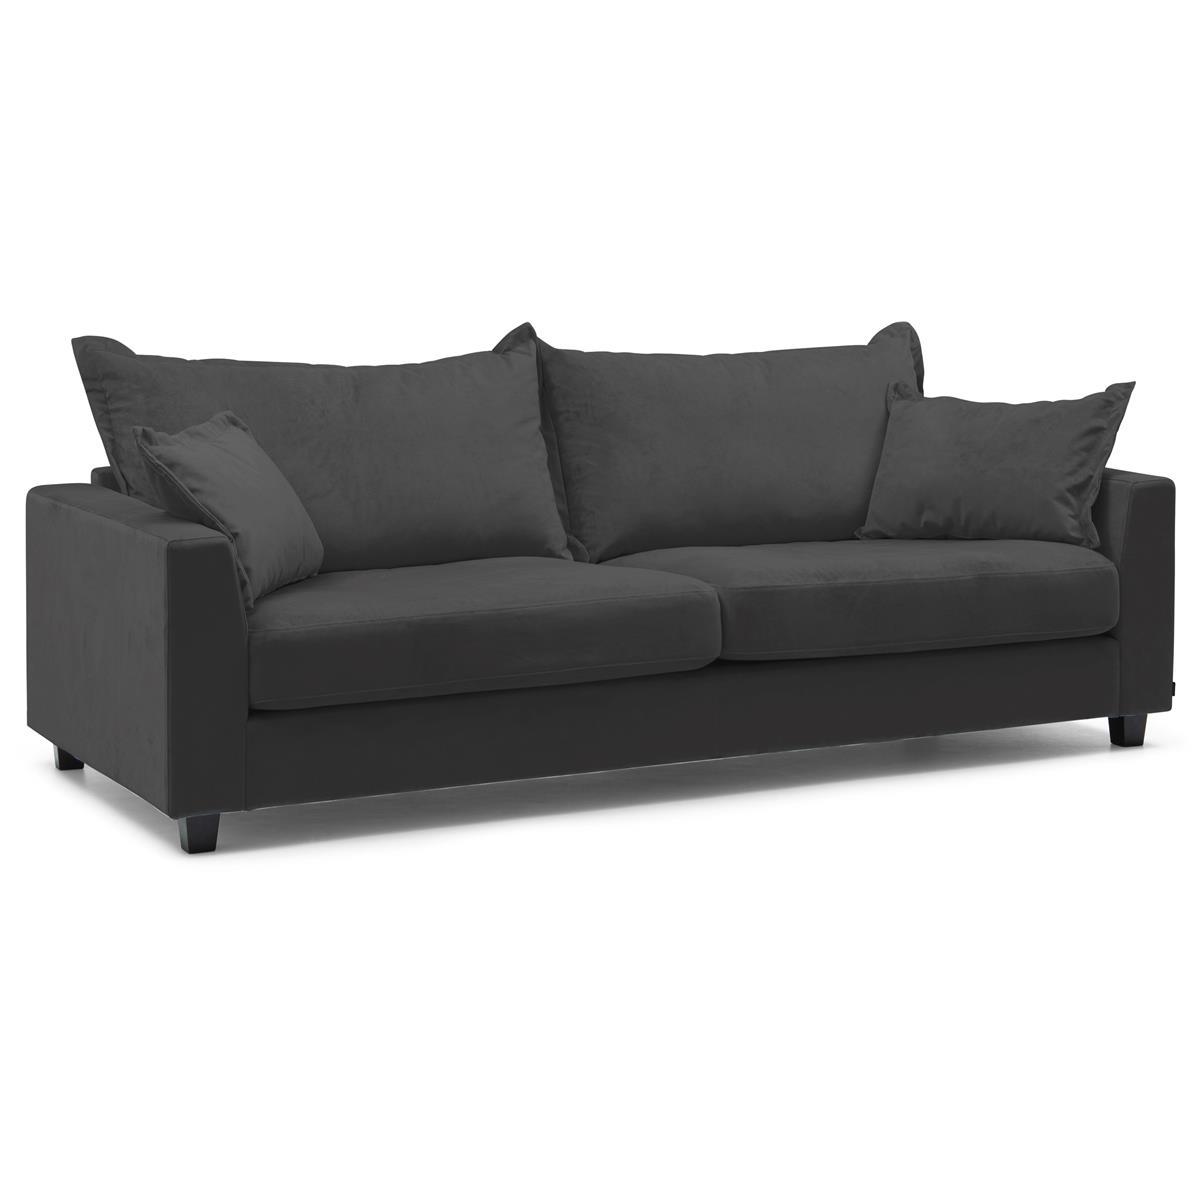 Louise-soffa-3-sits-meda-iron